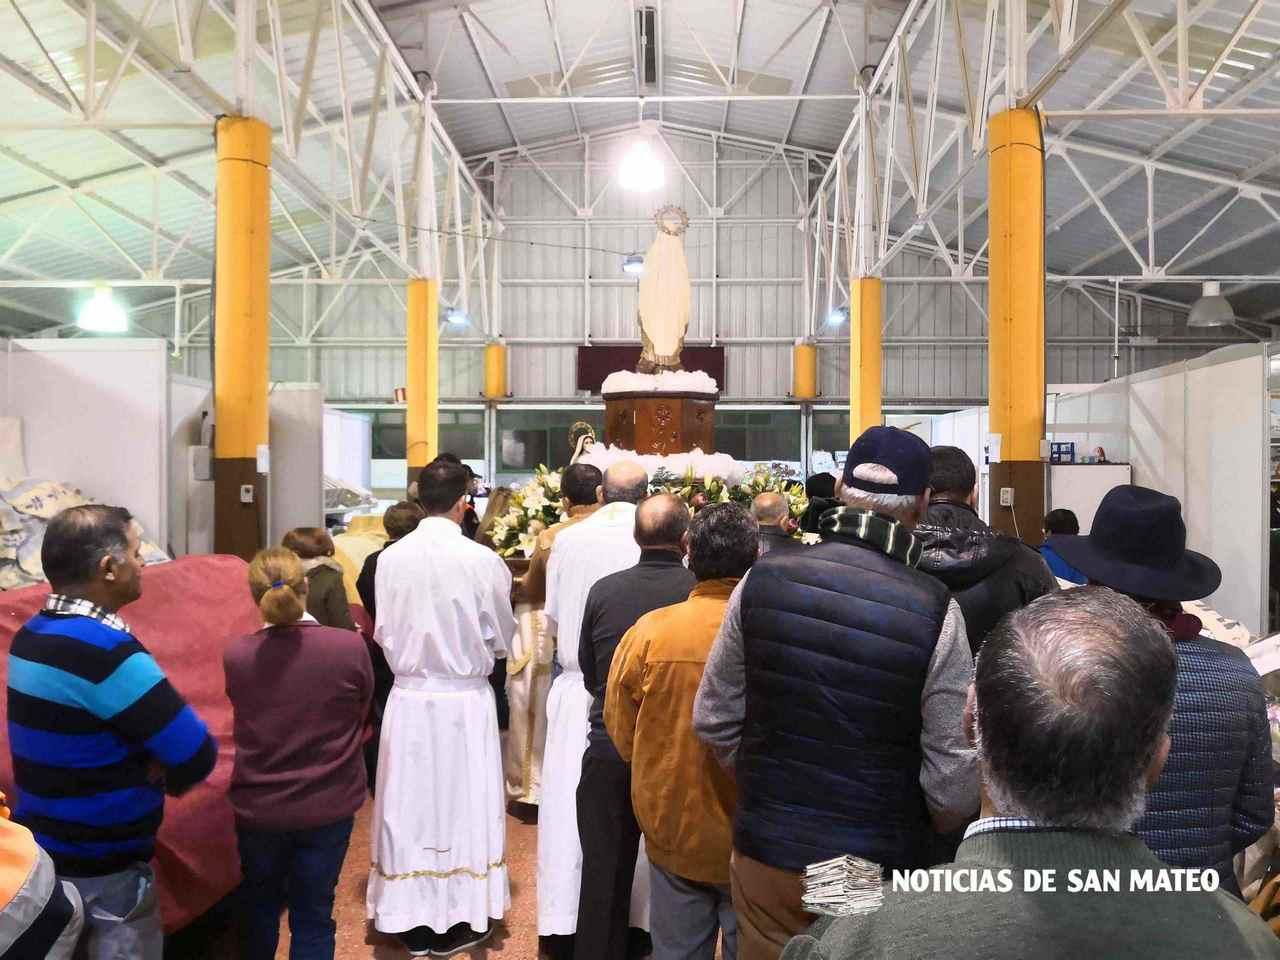 Fiestas de Lourdes en San Mateo 2019